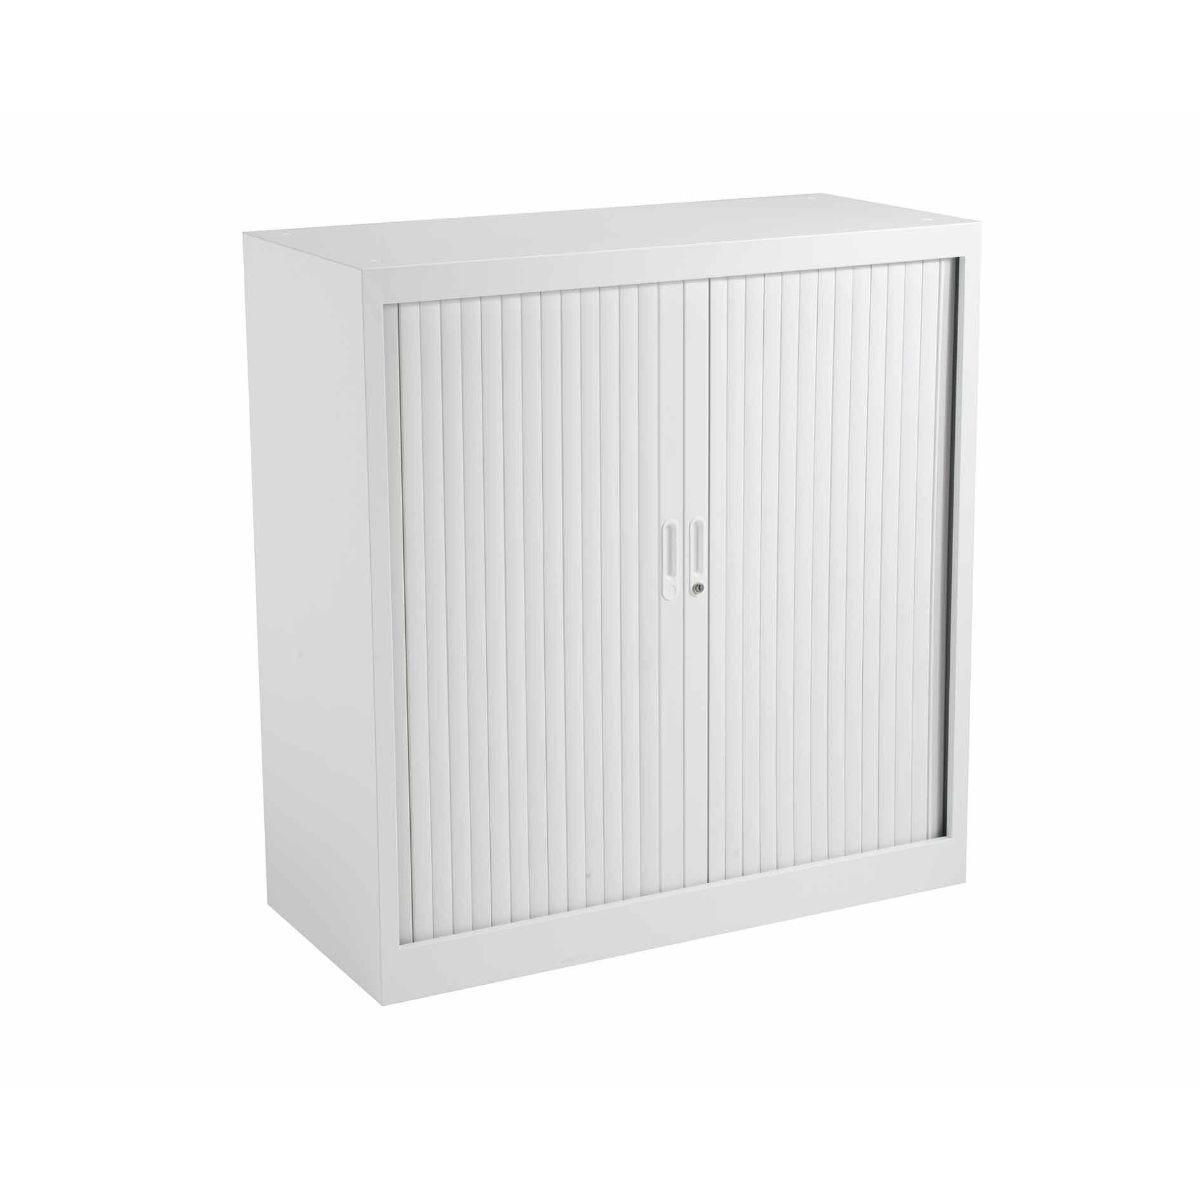 TC Office Talos Sliding Lockable Door Tambour Unit with 2 Shelves 1050mm Height White